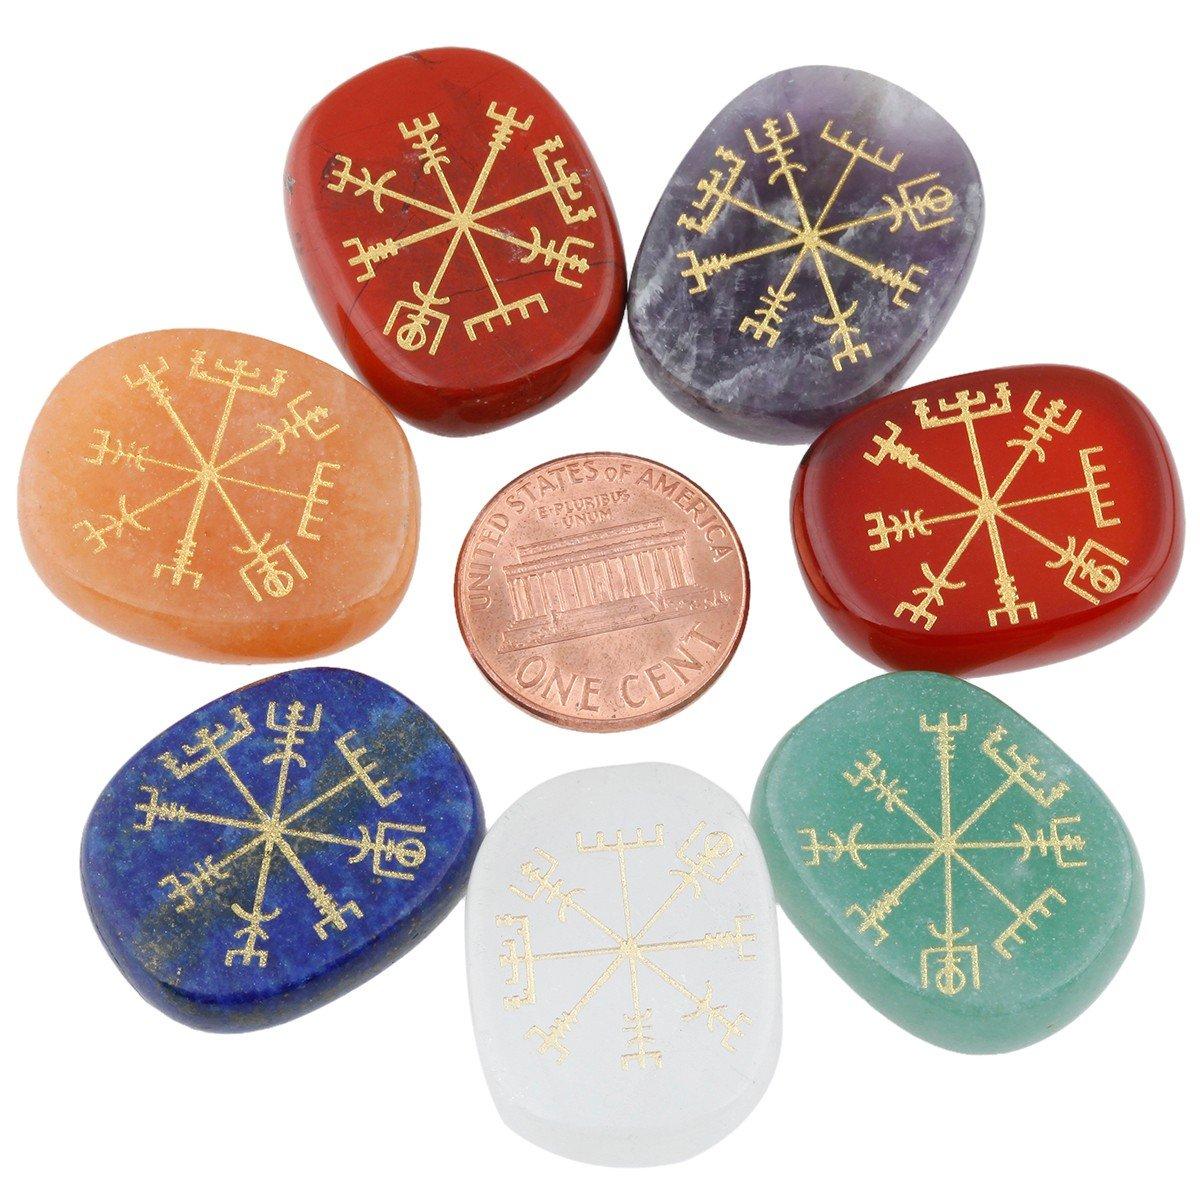 mookaitedecor 7 Piece Chakra Stones with Engraved Symbols Polished Palm Stone for Reiki Crystal Healing